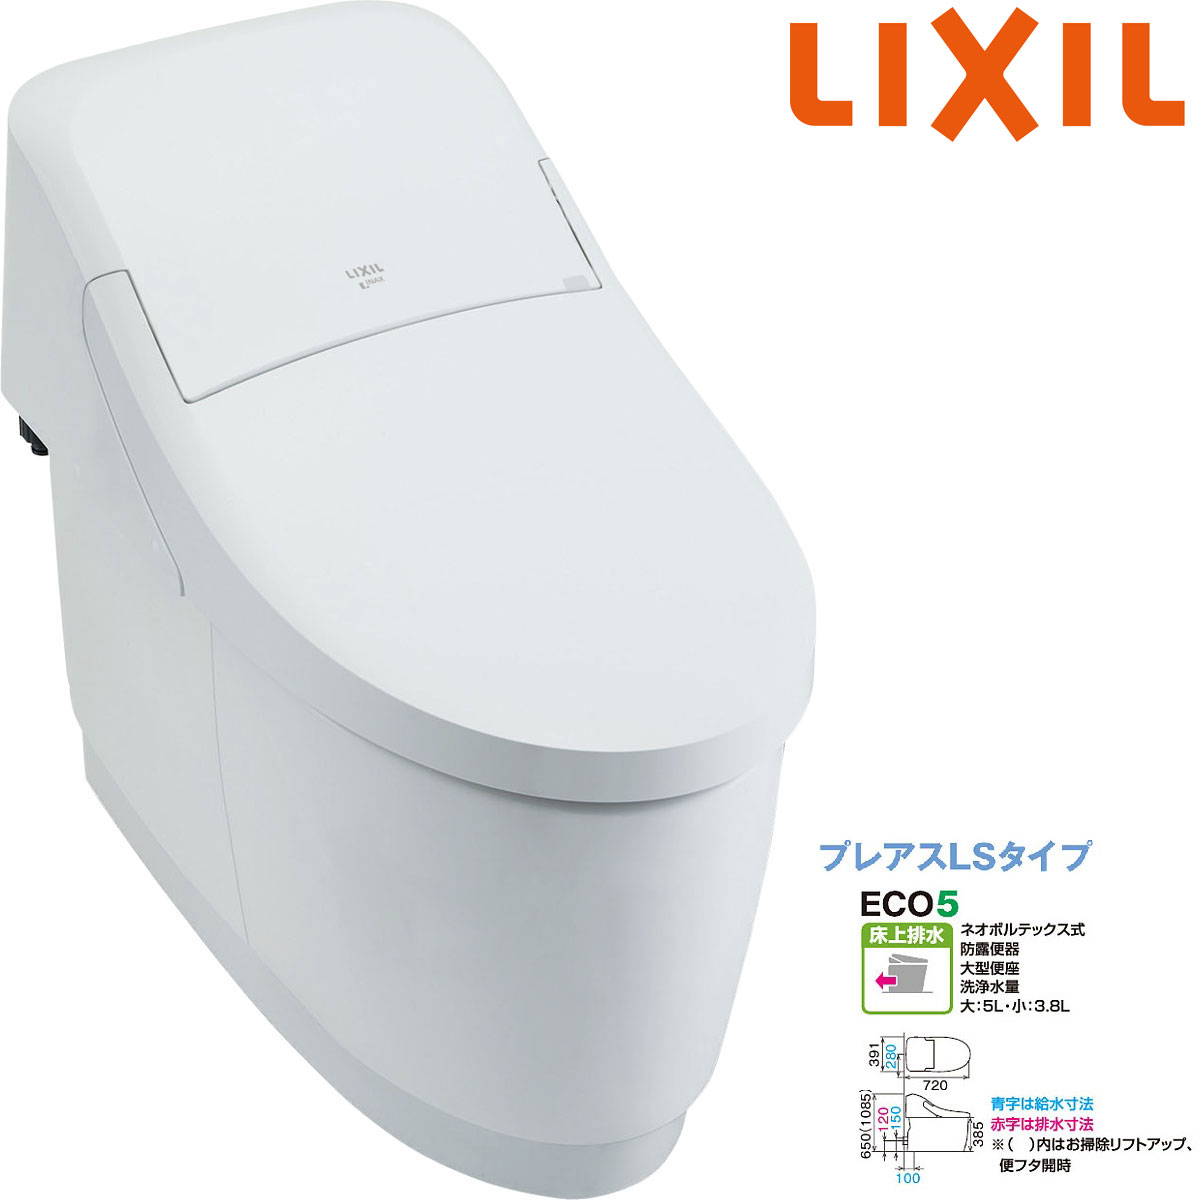 LIXIL(INAX) プレアスLSタイプ 床上排水 ECO5 グレード:CL4 YBC-CL10P+DT-CL114-R インテリアリモコン